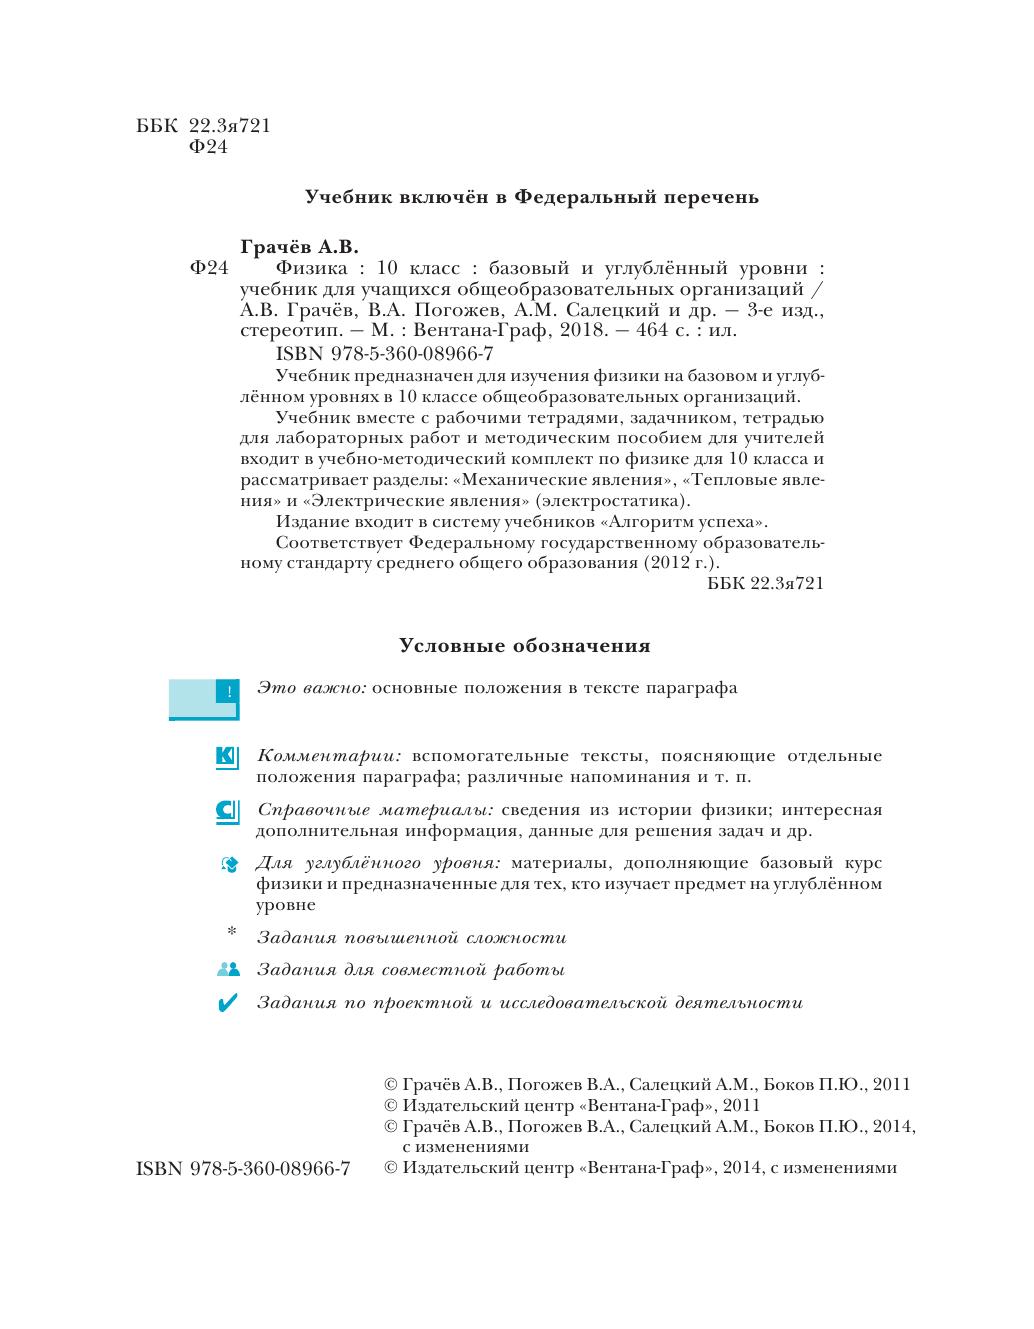 Решебник Физика 10 Класс Грачев Погожев Салецкий Боков